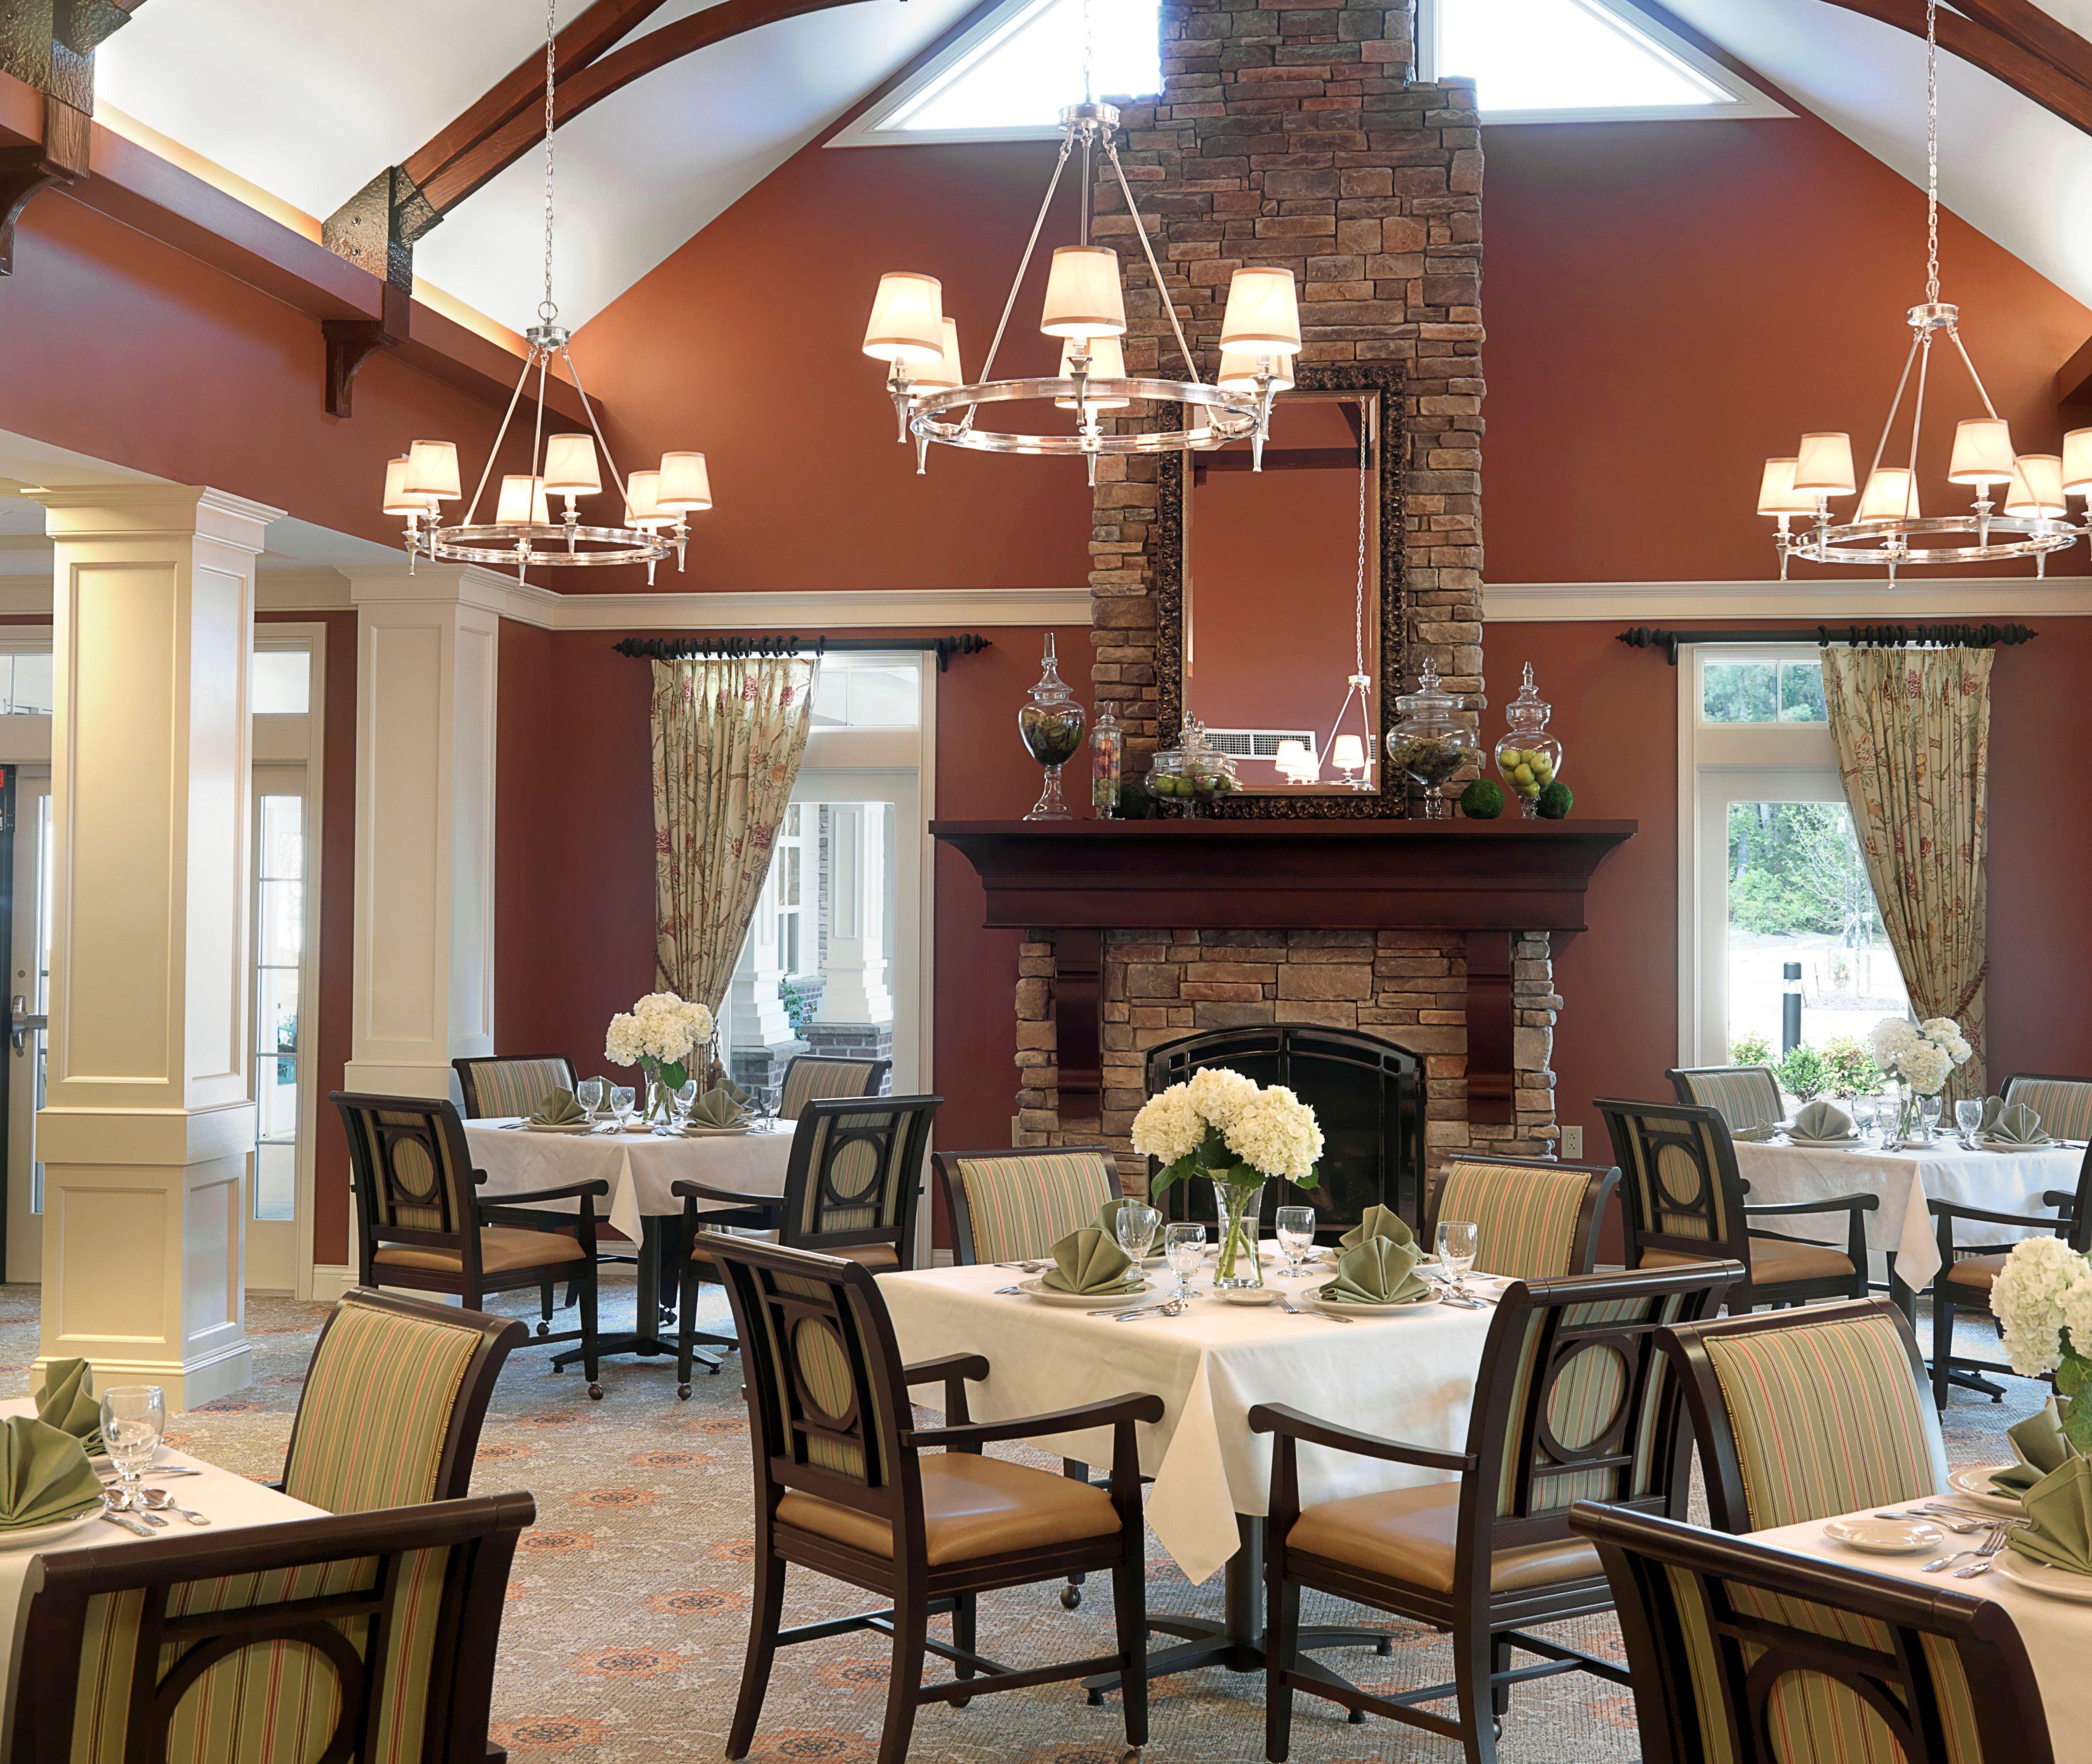 Home Design Ideas For Seniors: Dining Area Design, Retirement